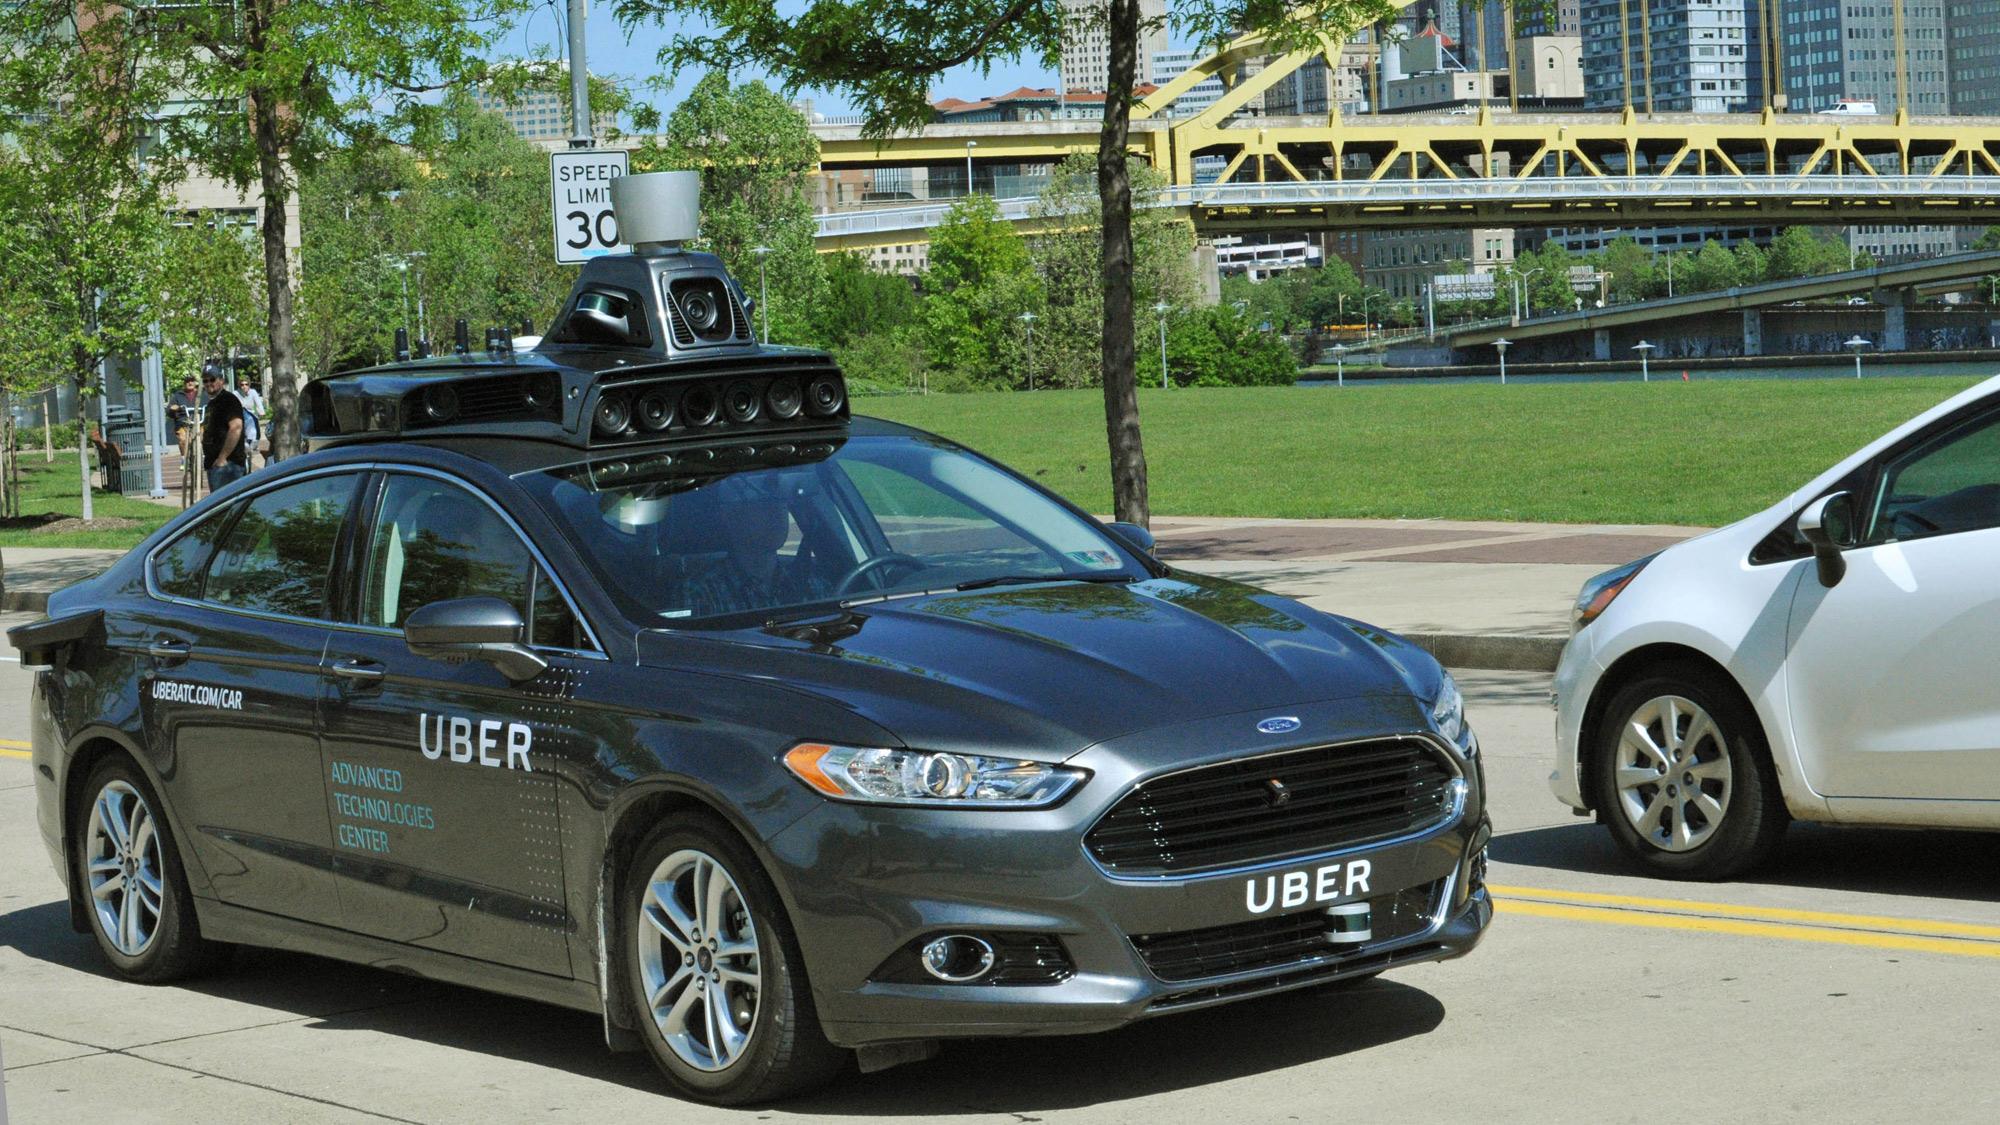 Uber Ford Fusion autonomous car